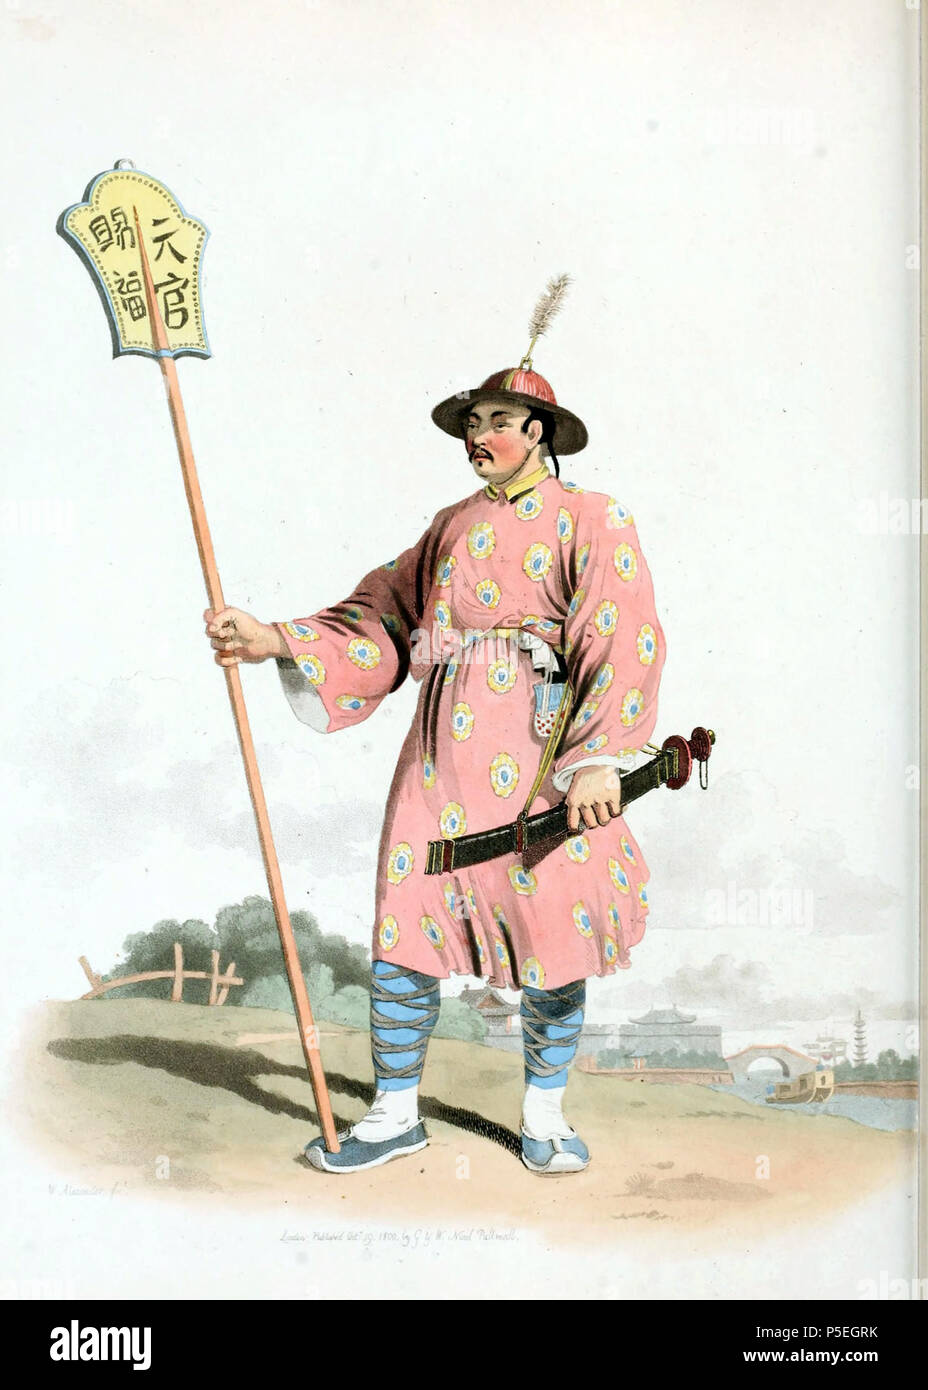 macartney mission to china